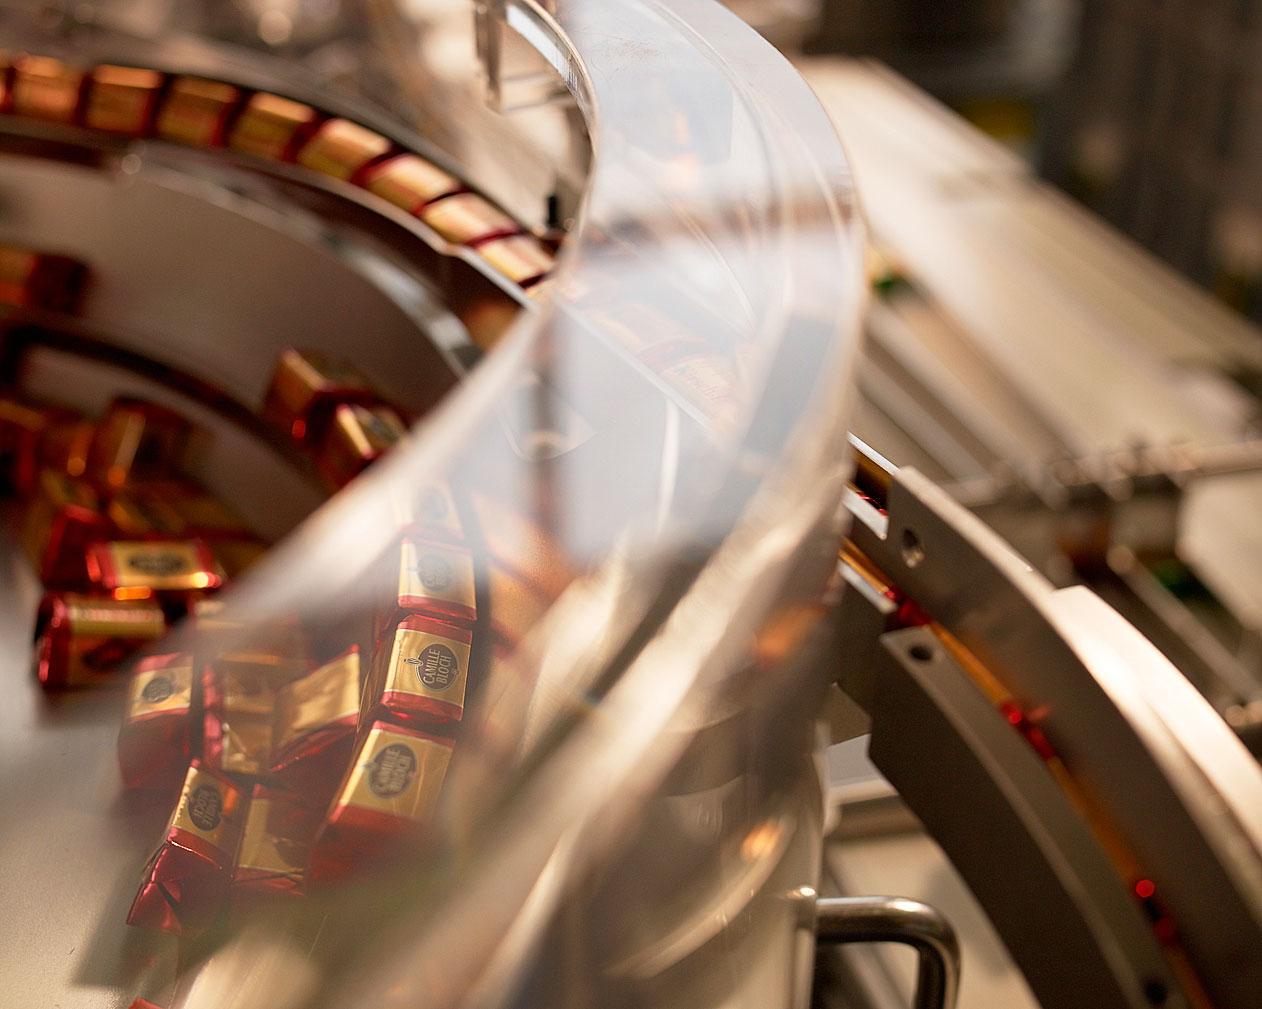 Фабрика Chocolats Camille Bloch